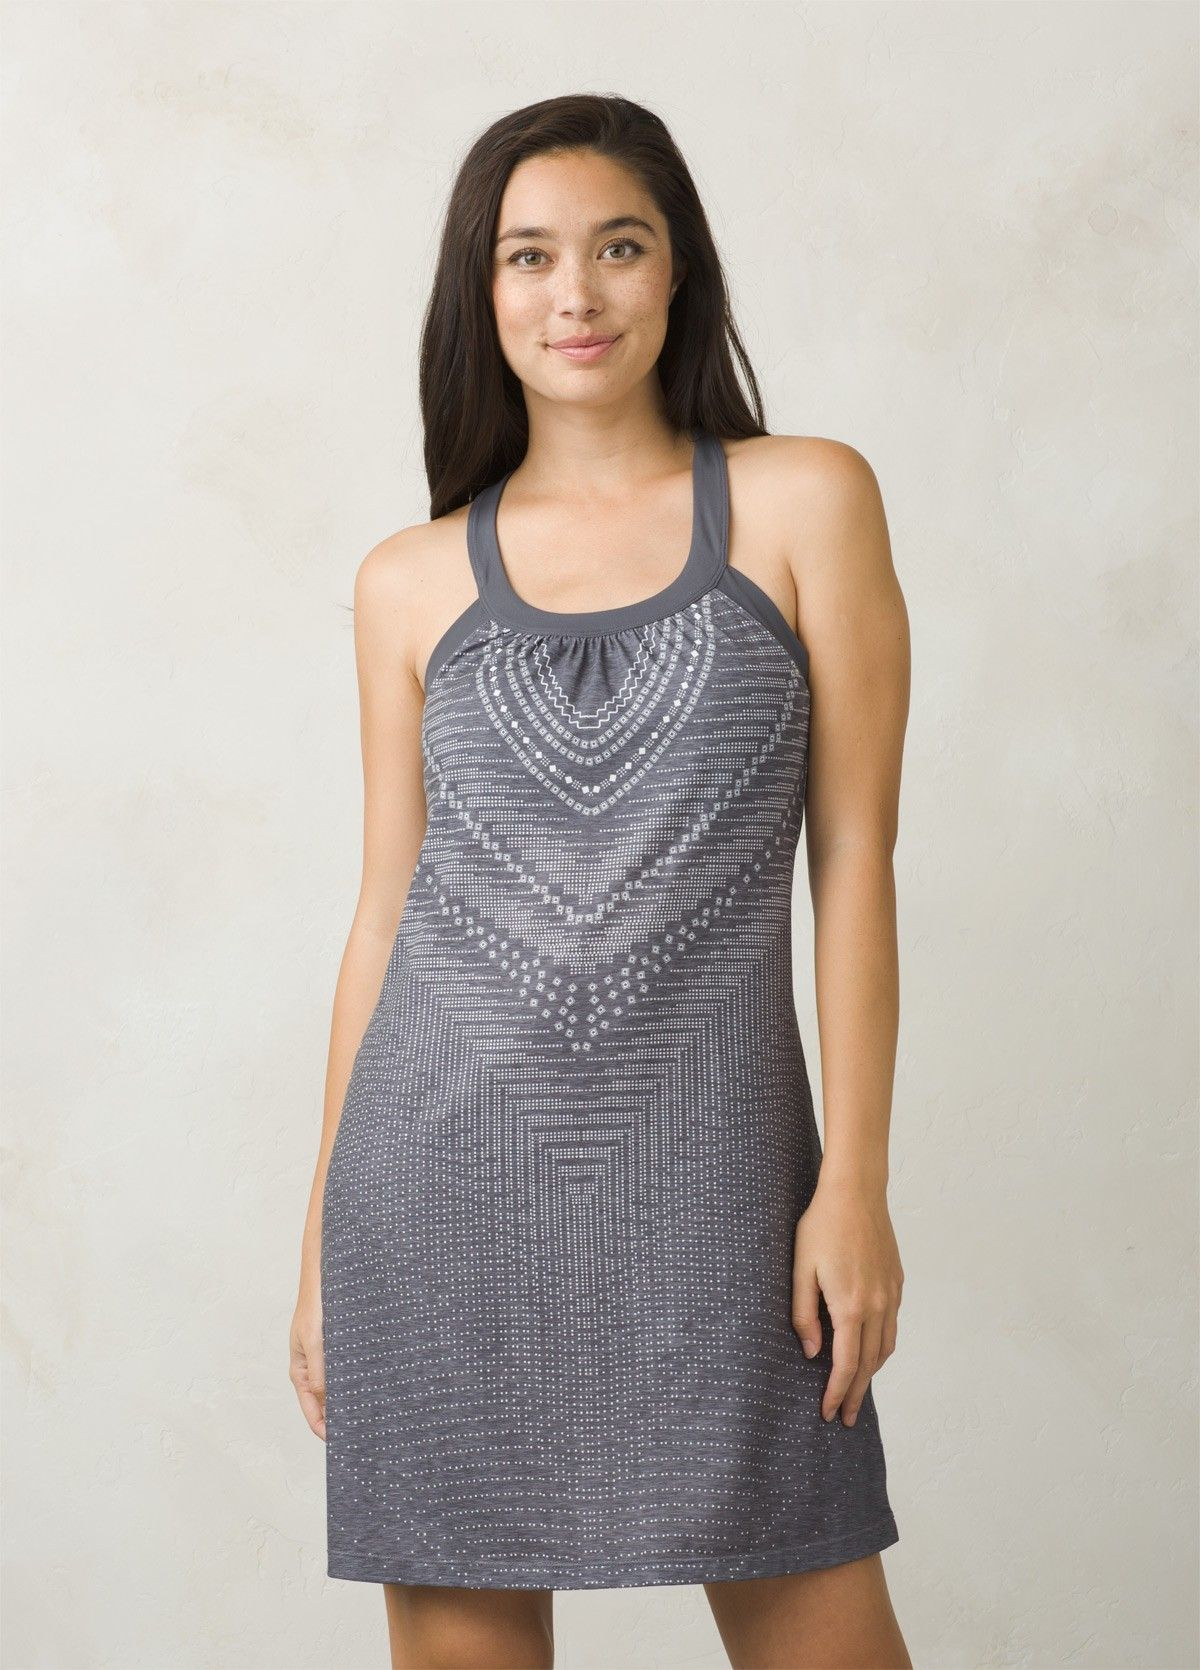 Cantine dress dresses free dresses sleeveless formal dress